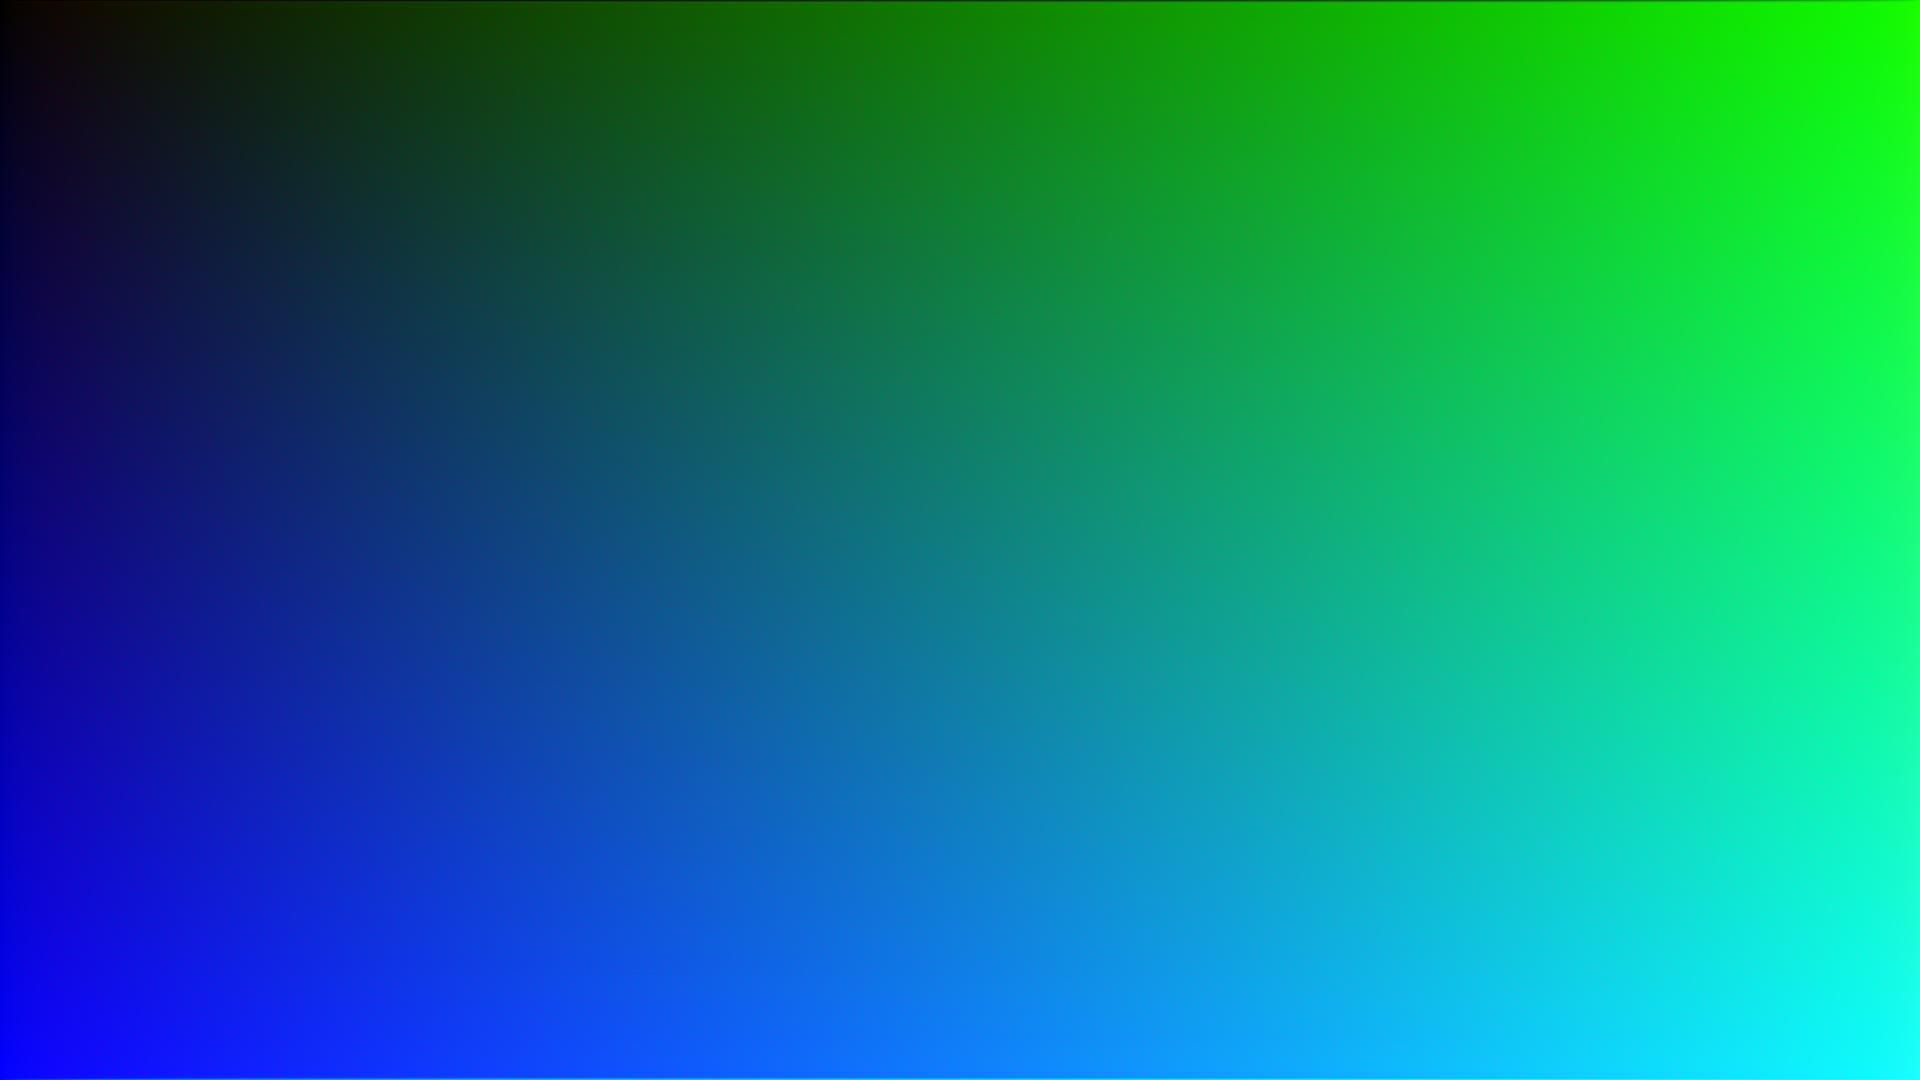 Blue-and-green gradient screenshot